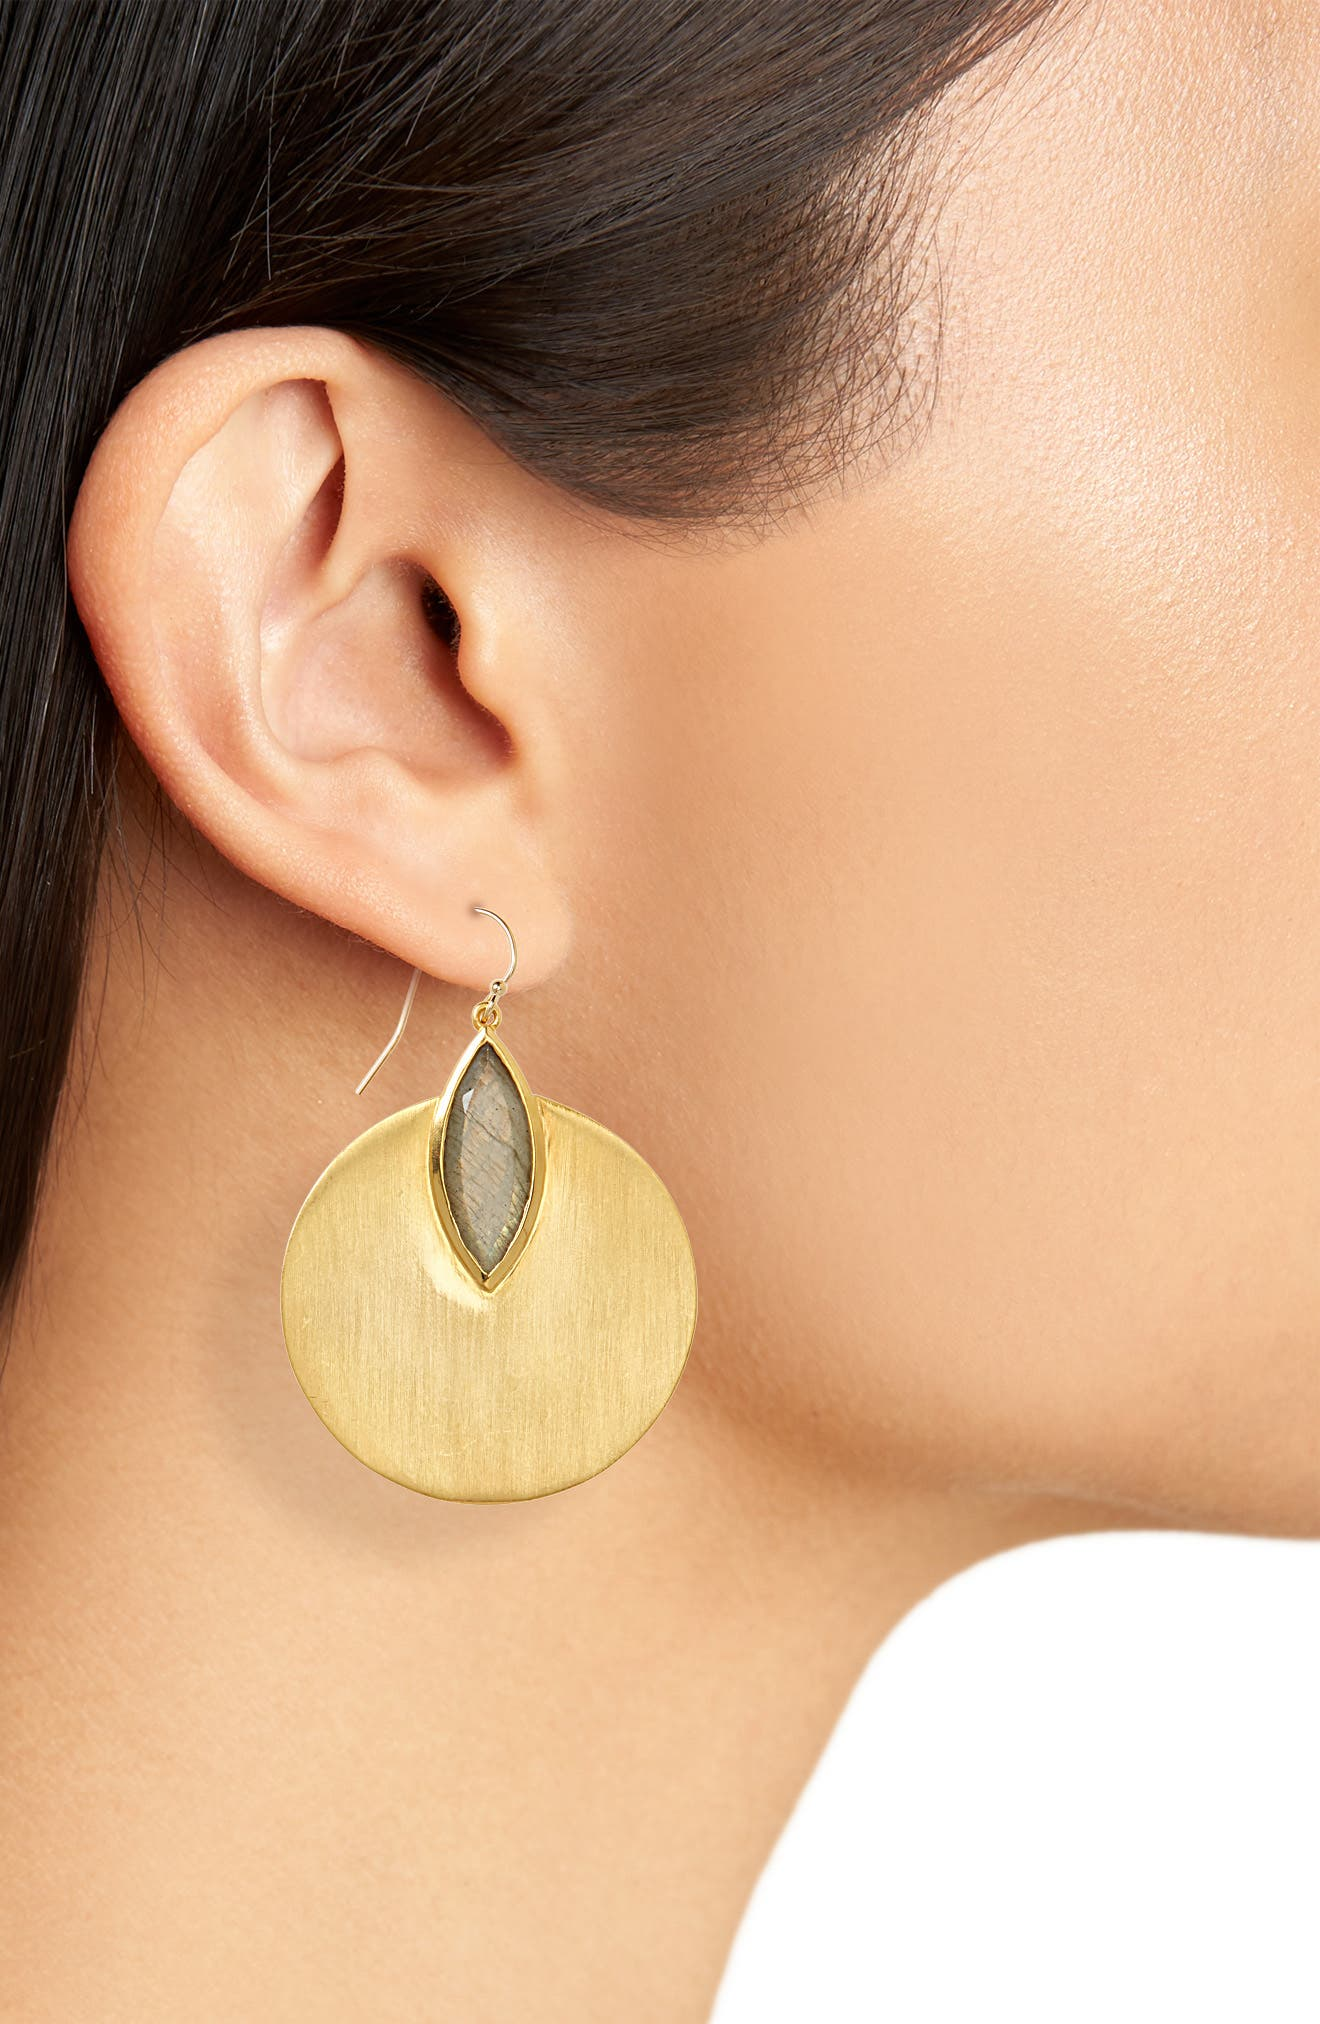 Lotus Disc Earrings,                             Alternate thumbnail 2, color,                             Labradorite/ Gold